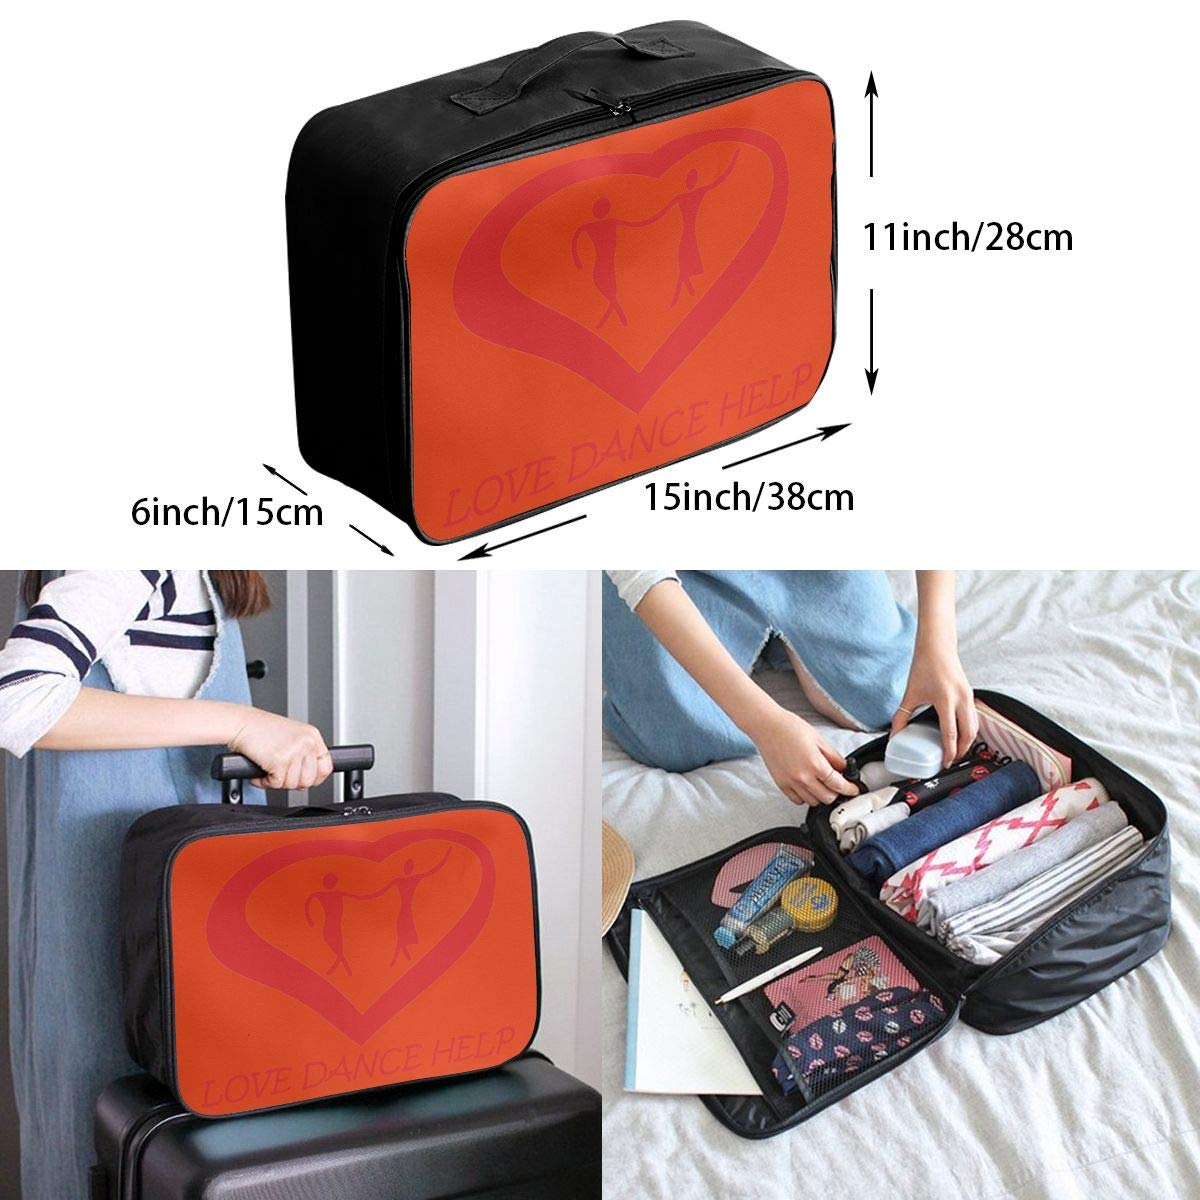 Travel Luggage Duffle Bag Lightweight Portable Handbag Love Dance Help Large Capacity Waterproof Foldable Storage Tote